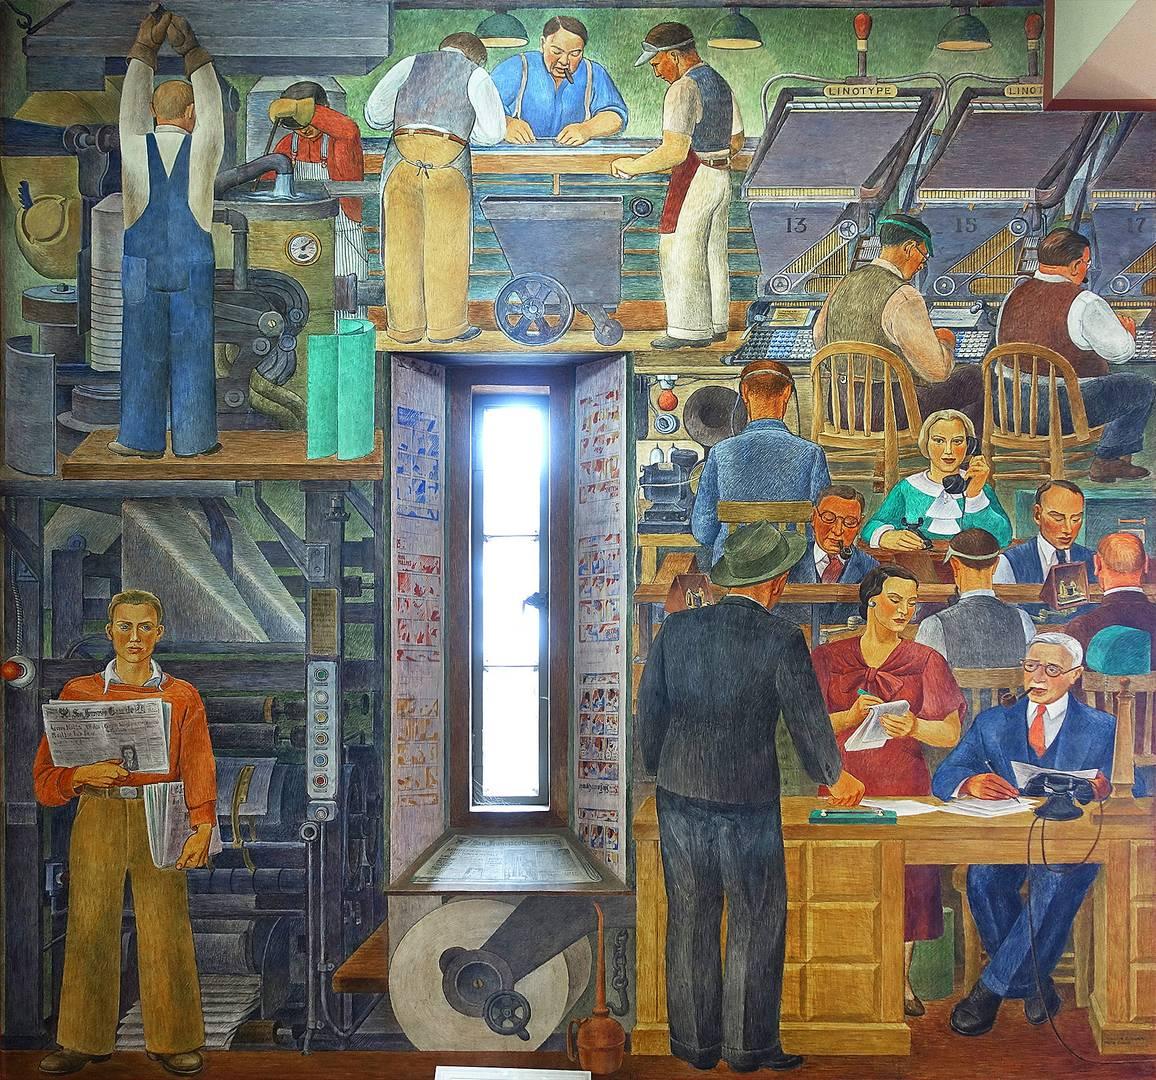 Сюзанна Шойер. Сбор новостей. Фреска в Койт-Тауэр, Сан-Франциско. 1930-е